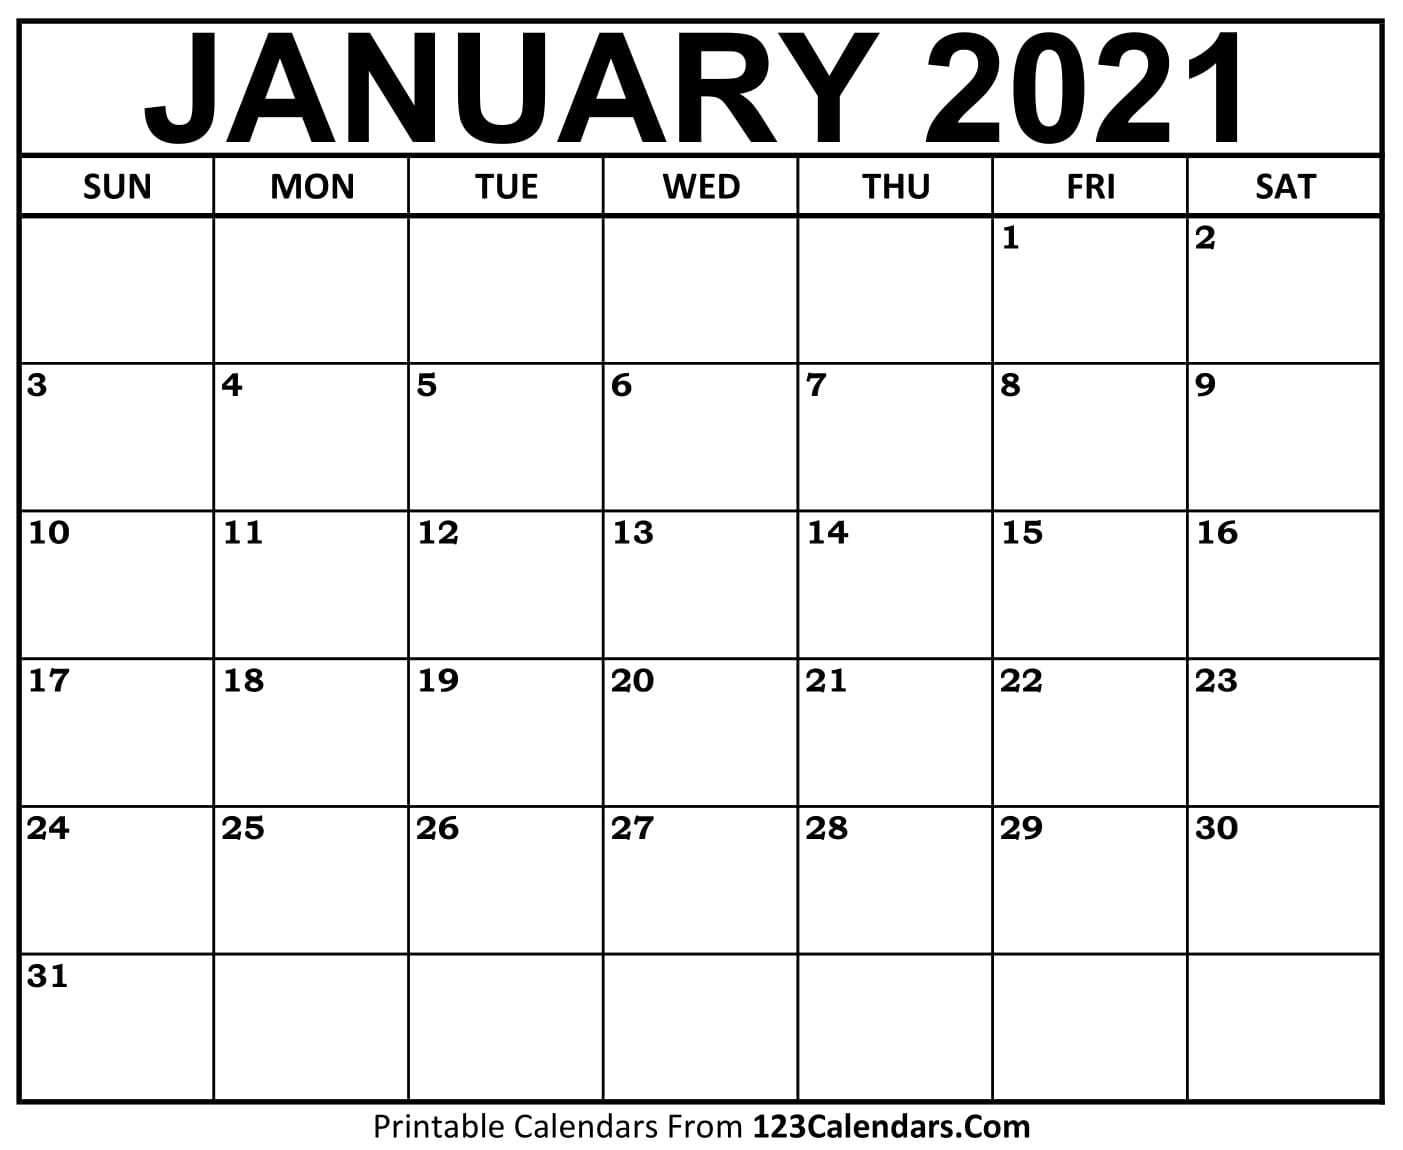 January 2021 Printable Calendar   Free Printable Calendar Wiki Calendar August 2021